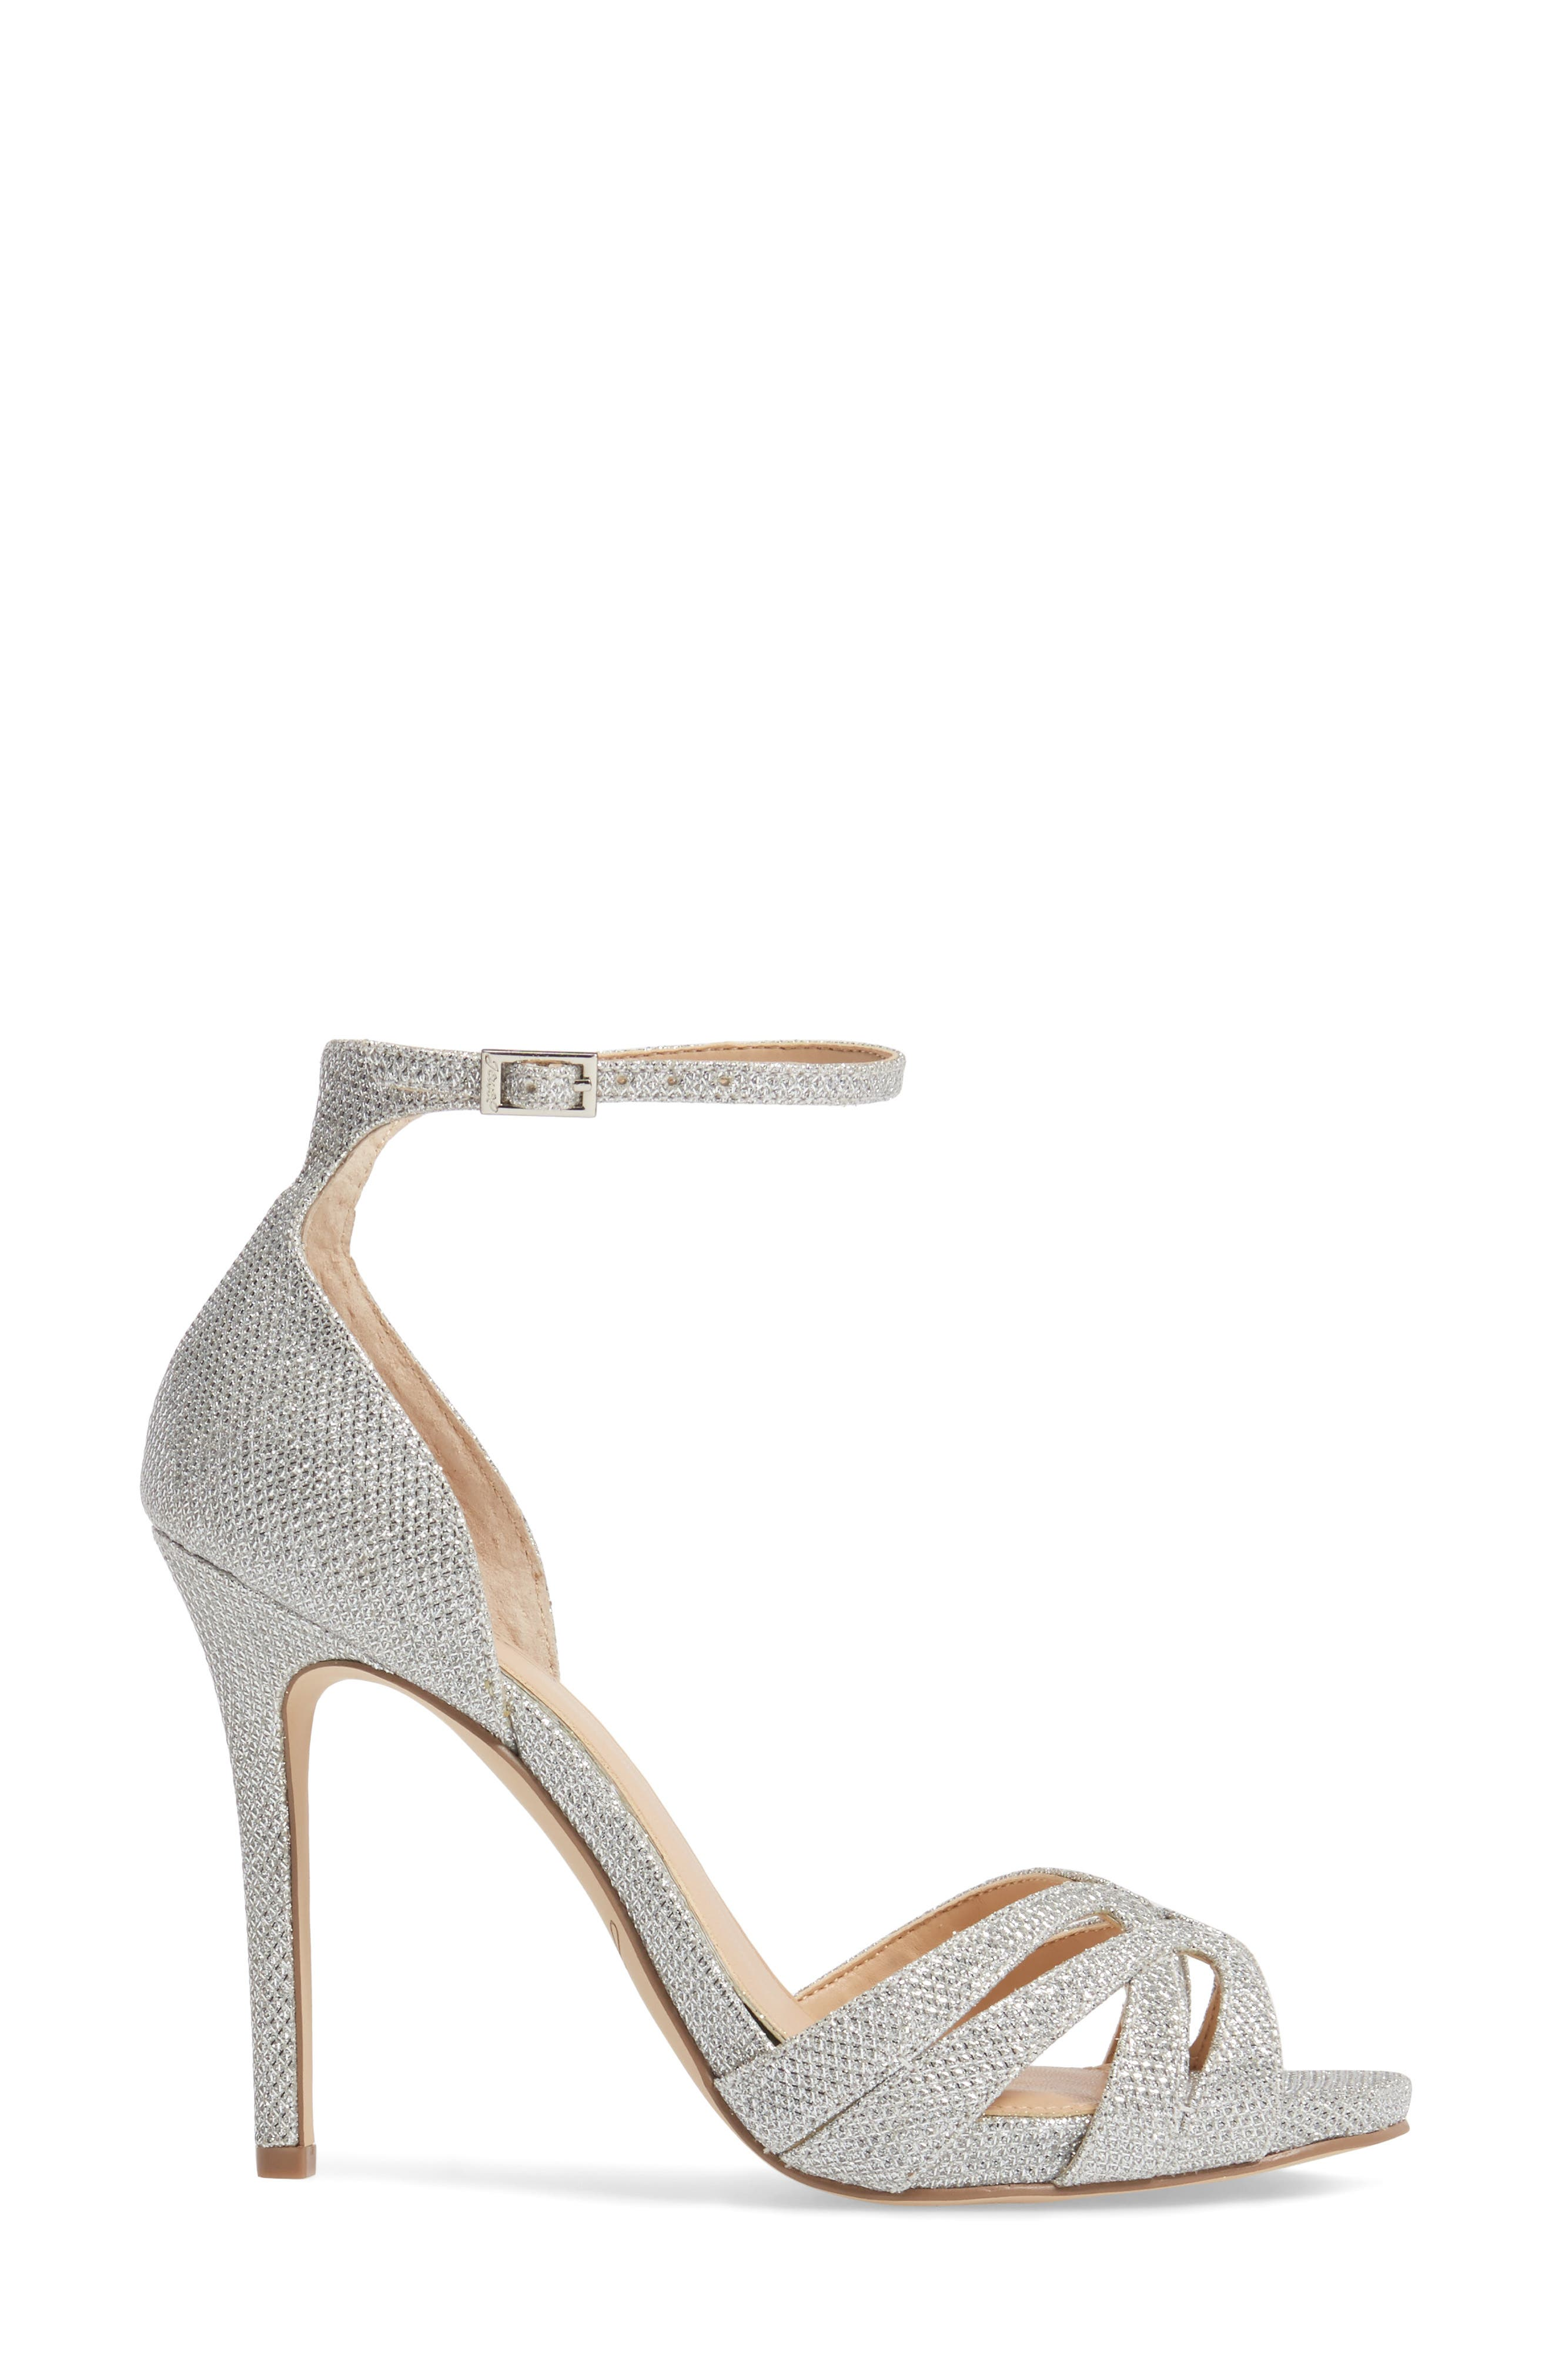 Alternate Image 3  - Jewel Badgley Mischka Loyal Glitter Sandal (Women)